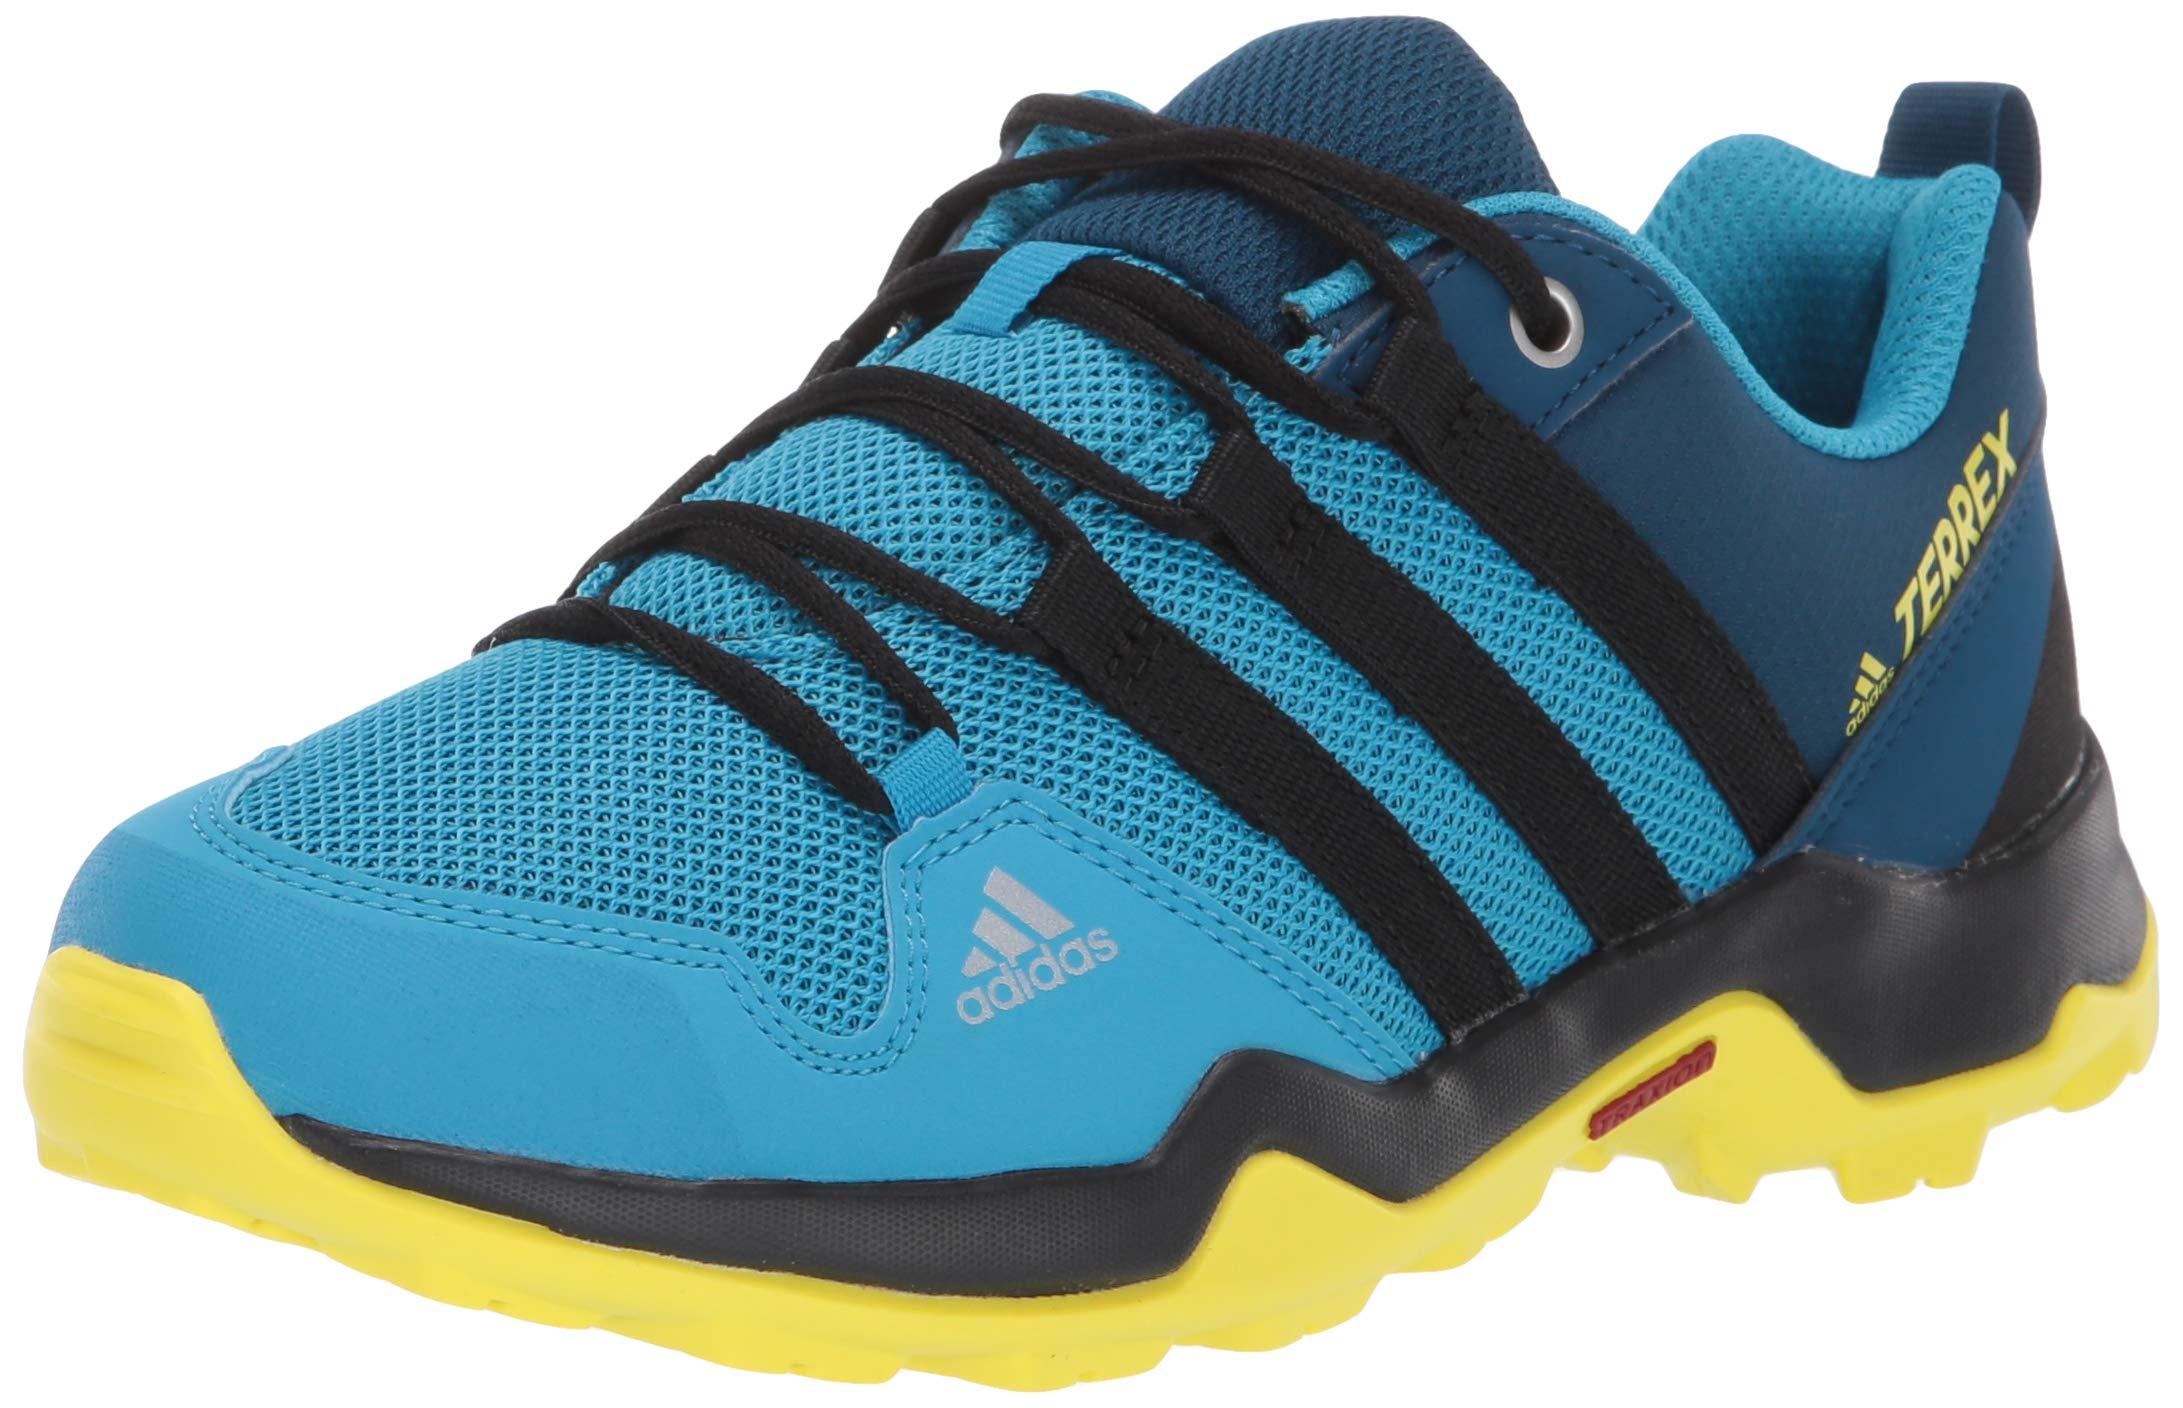 adidas outdoor Terrex AX2R Kids Hiking Shoe Boot, Cyan/Black/Shock Yellow, 4.5 Child US Big